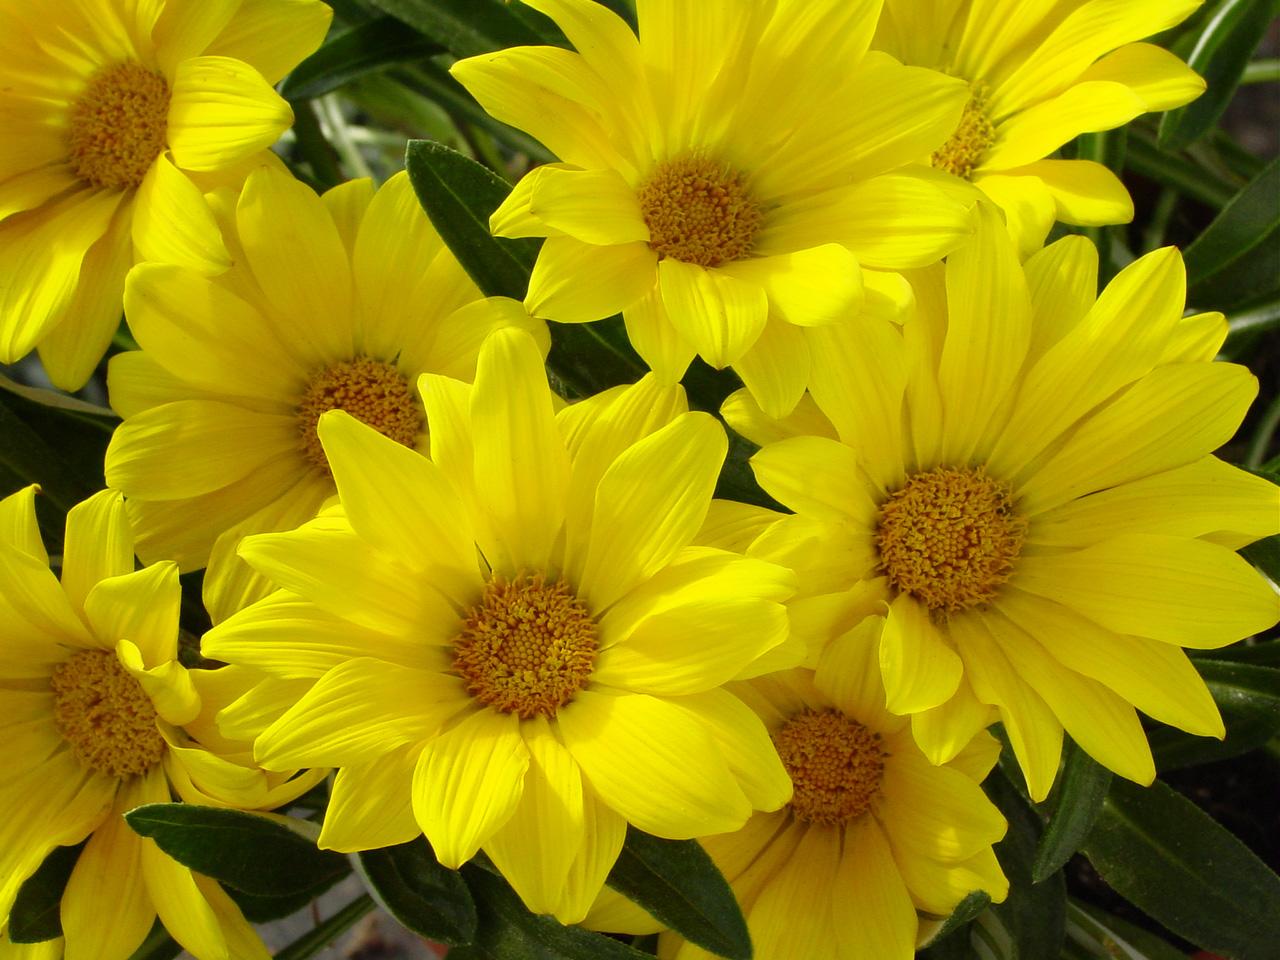 Golden yellow flowers dlt growers gazania trailing green leaf armstrong gold mightylinksfo